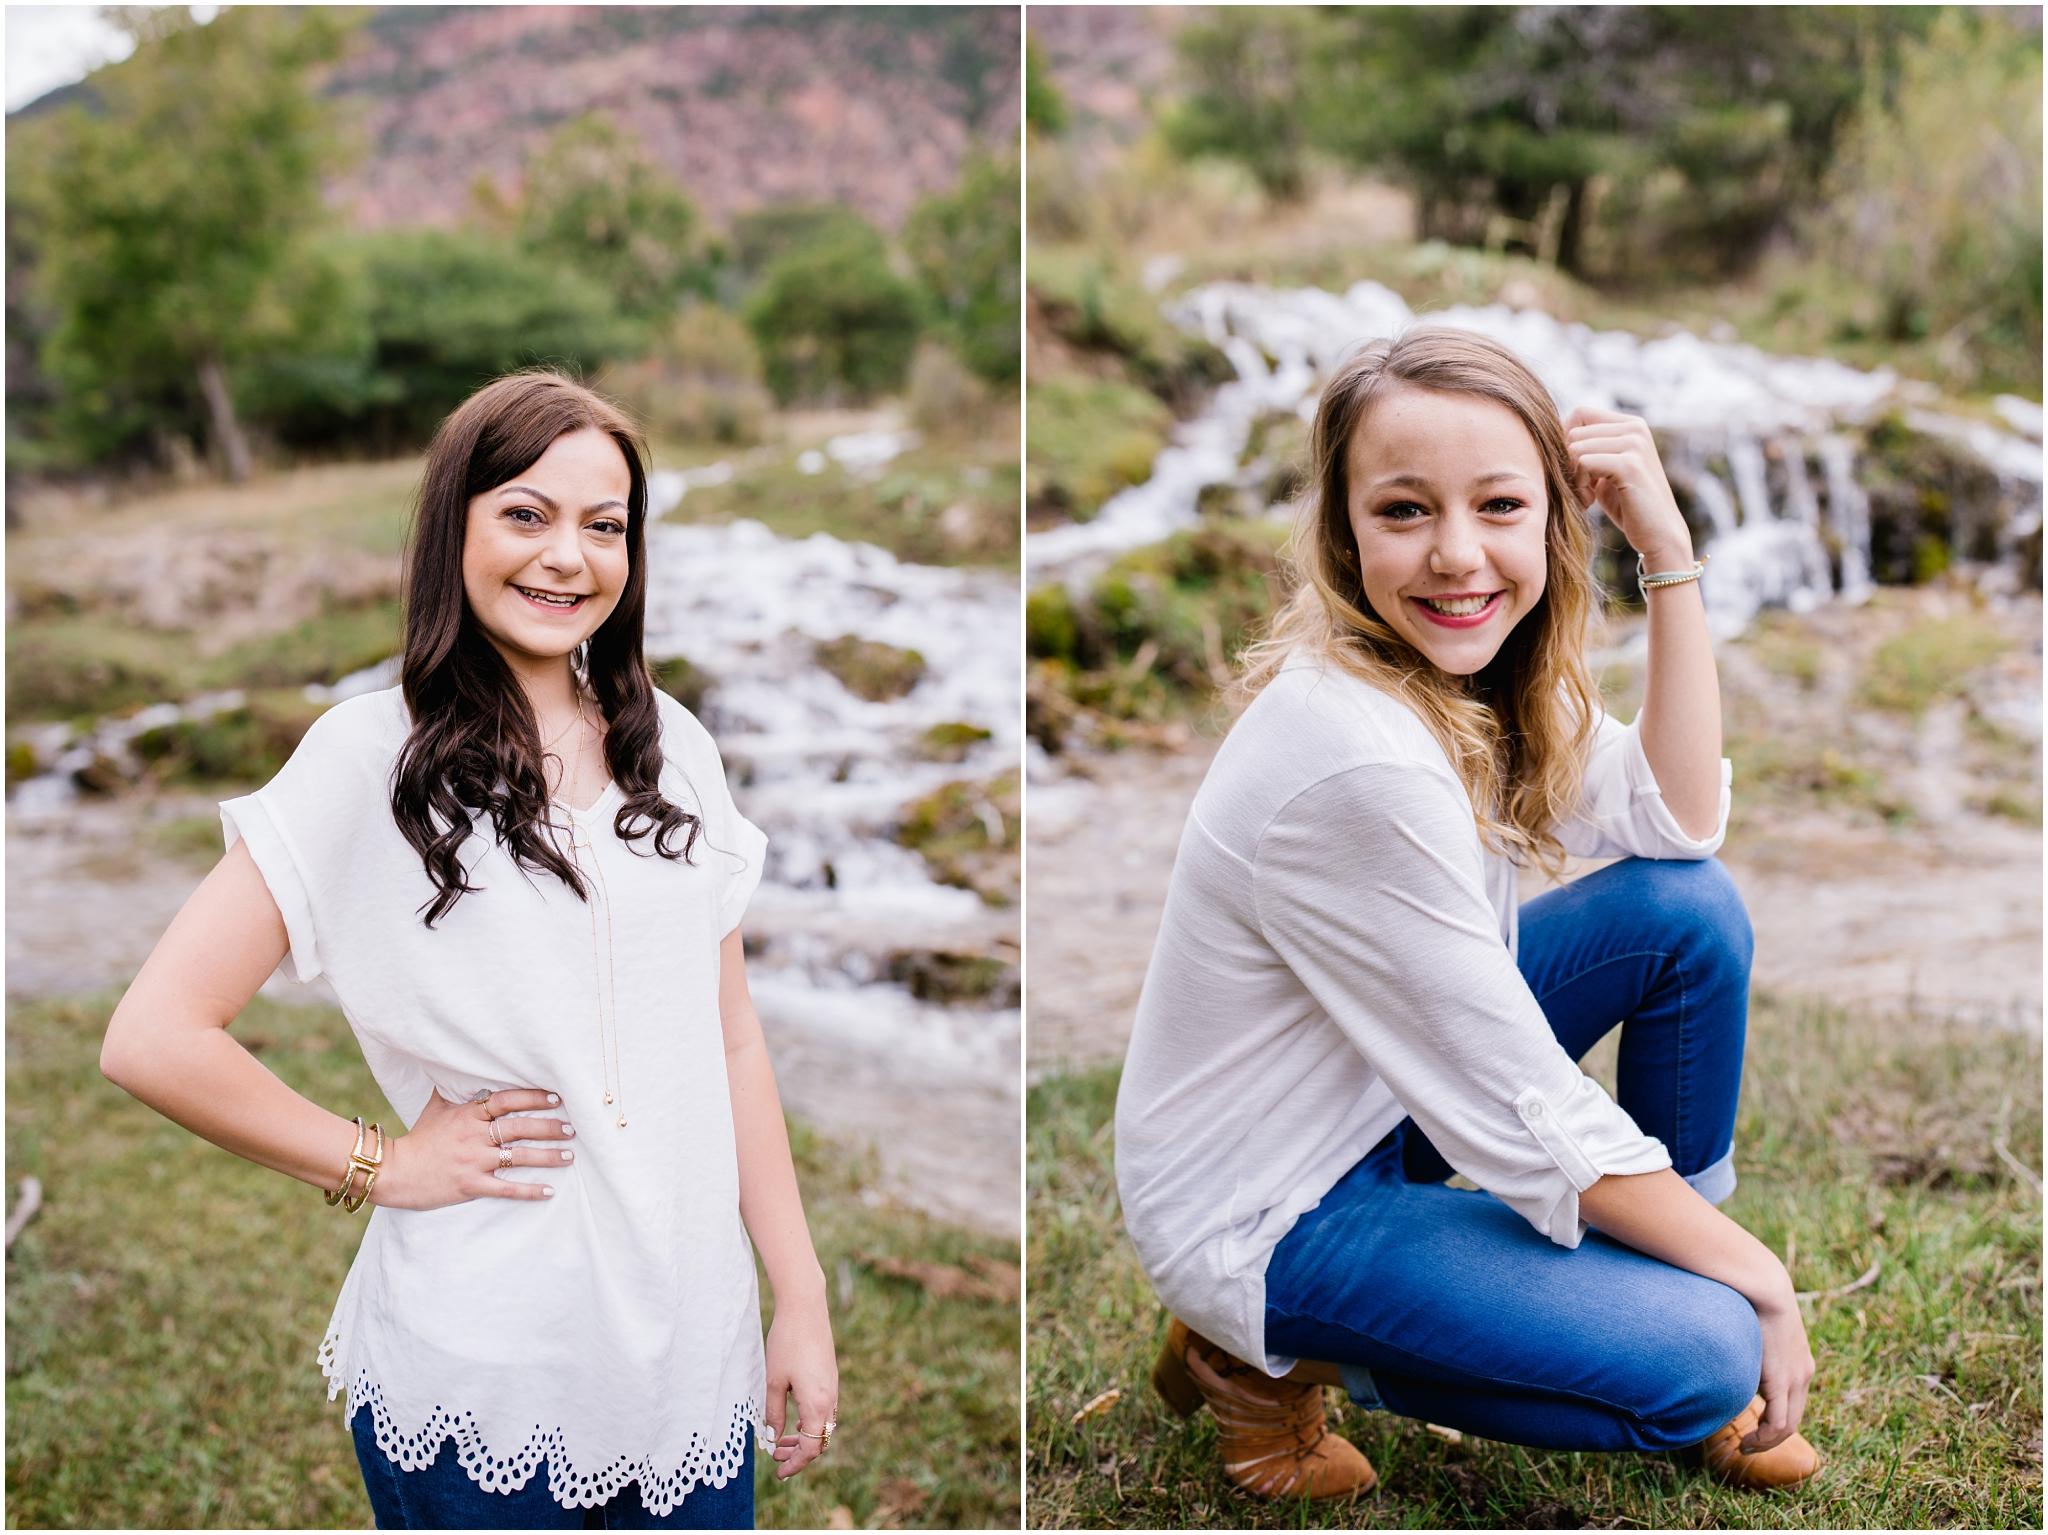 GVHSDRILL-99_Lizzie-B-Imagery-Utah-Family-Photographer-Central-Utah-Park-City-Salt-Lake-City-Drill-Team-Photography-Dance.jpg